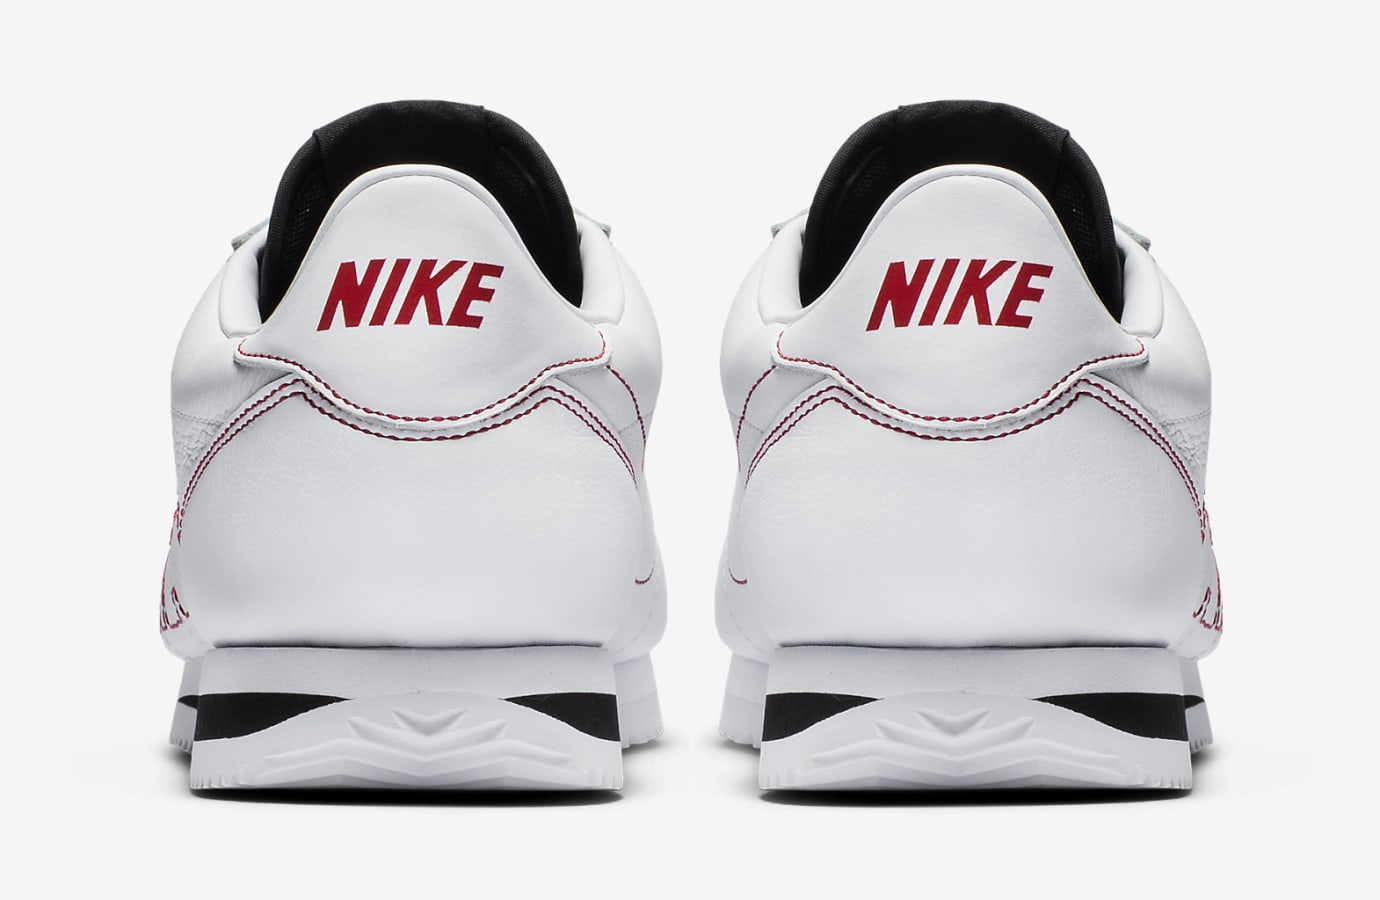 80f21a15867 Image via Nike Kendrick Lamar Nike Cortez Kenny Damn AV8255-106 Heel